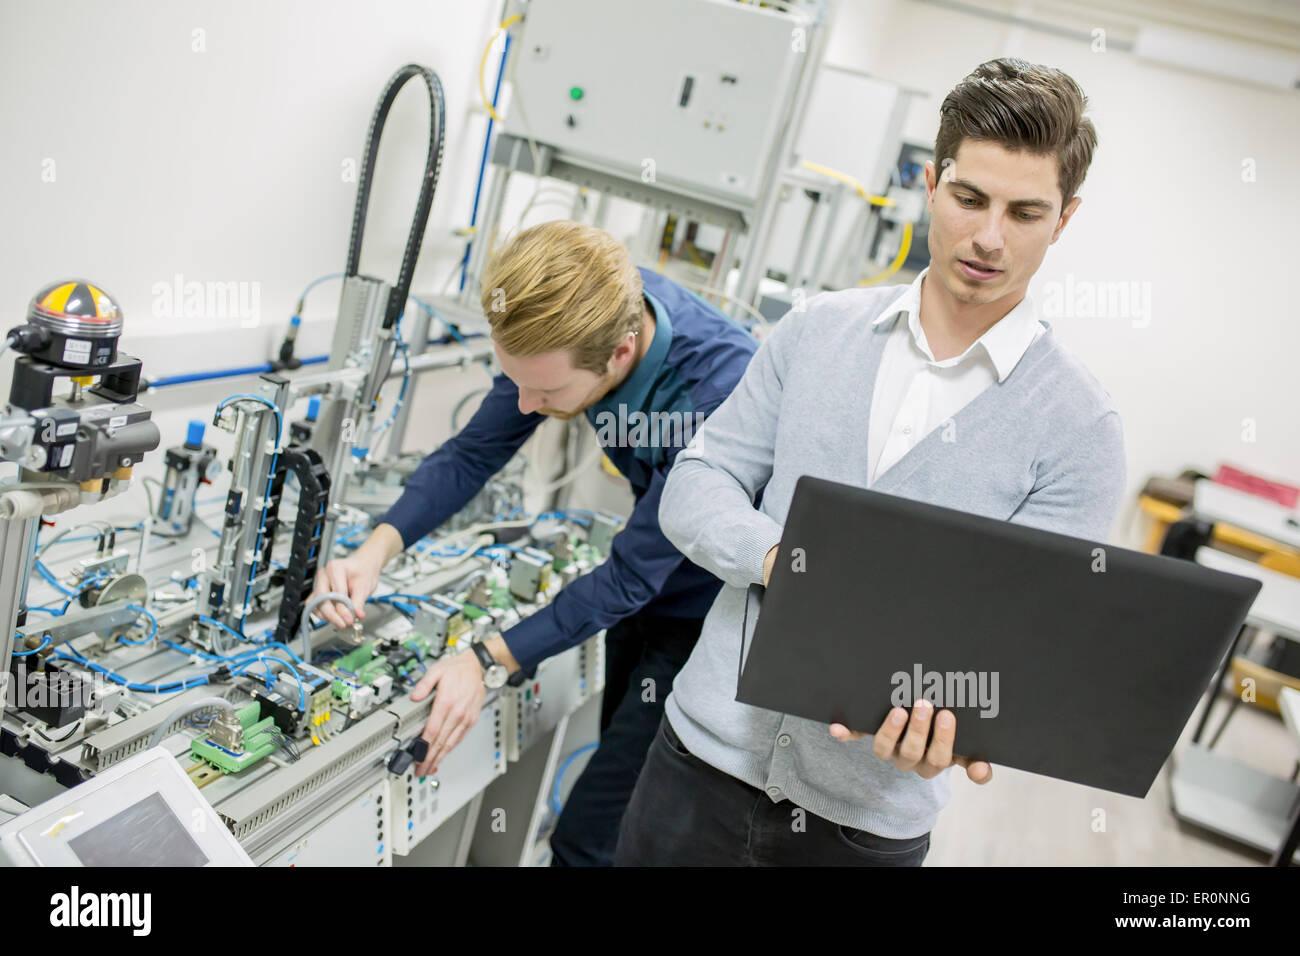 Ingenieure in der Fabrik Stockbild